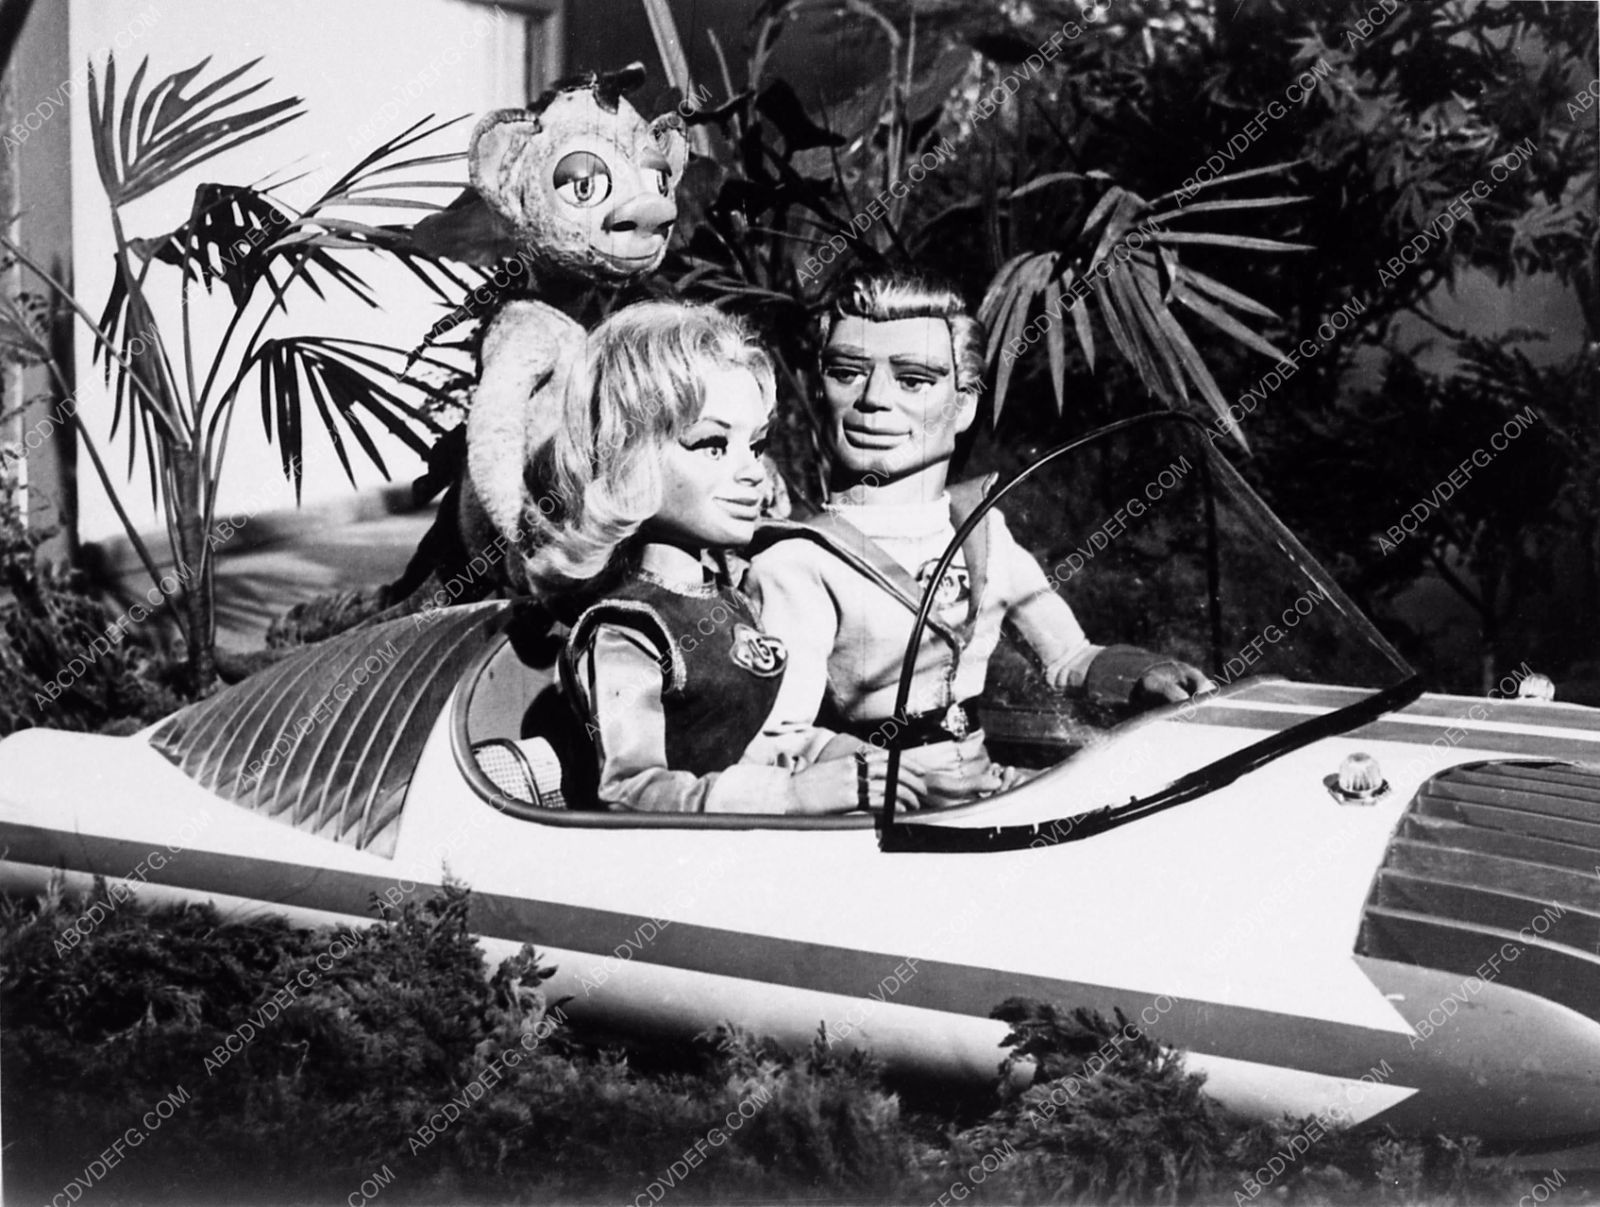 Photo Marionettes Tv Show Fireball Xl5 Gerry Sylvia Anderson 3643 19 Old Cartoons Thunderbirds Are Go Tv Shows